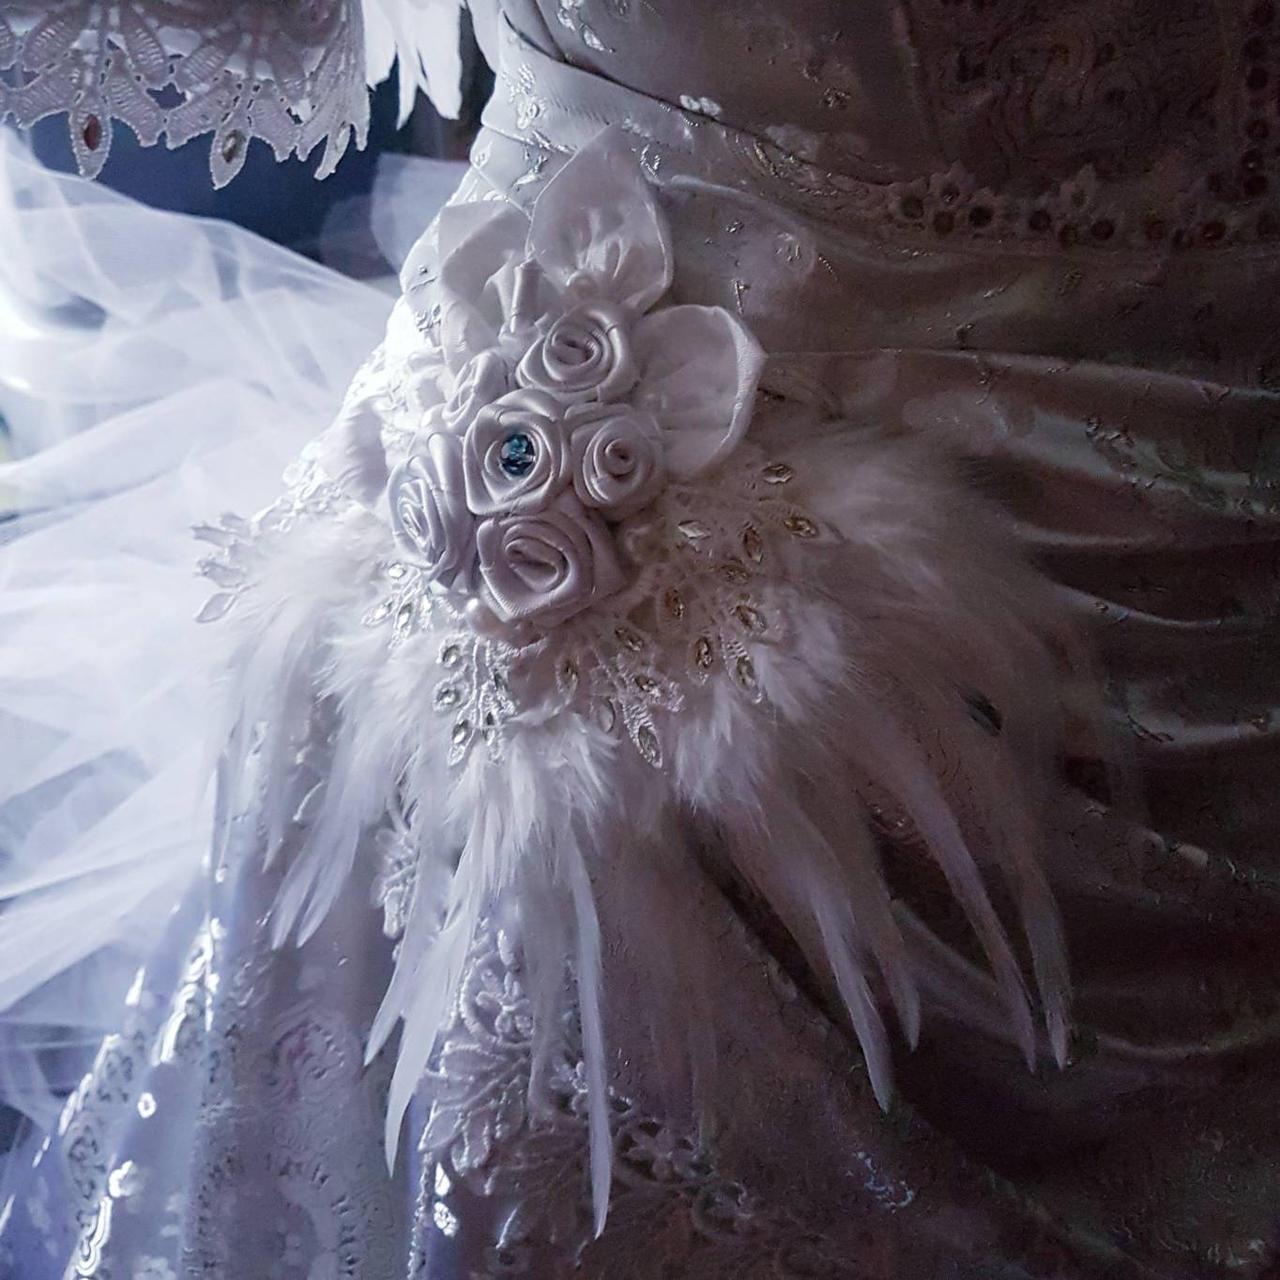 Swan gown detail